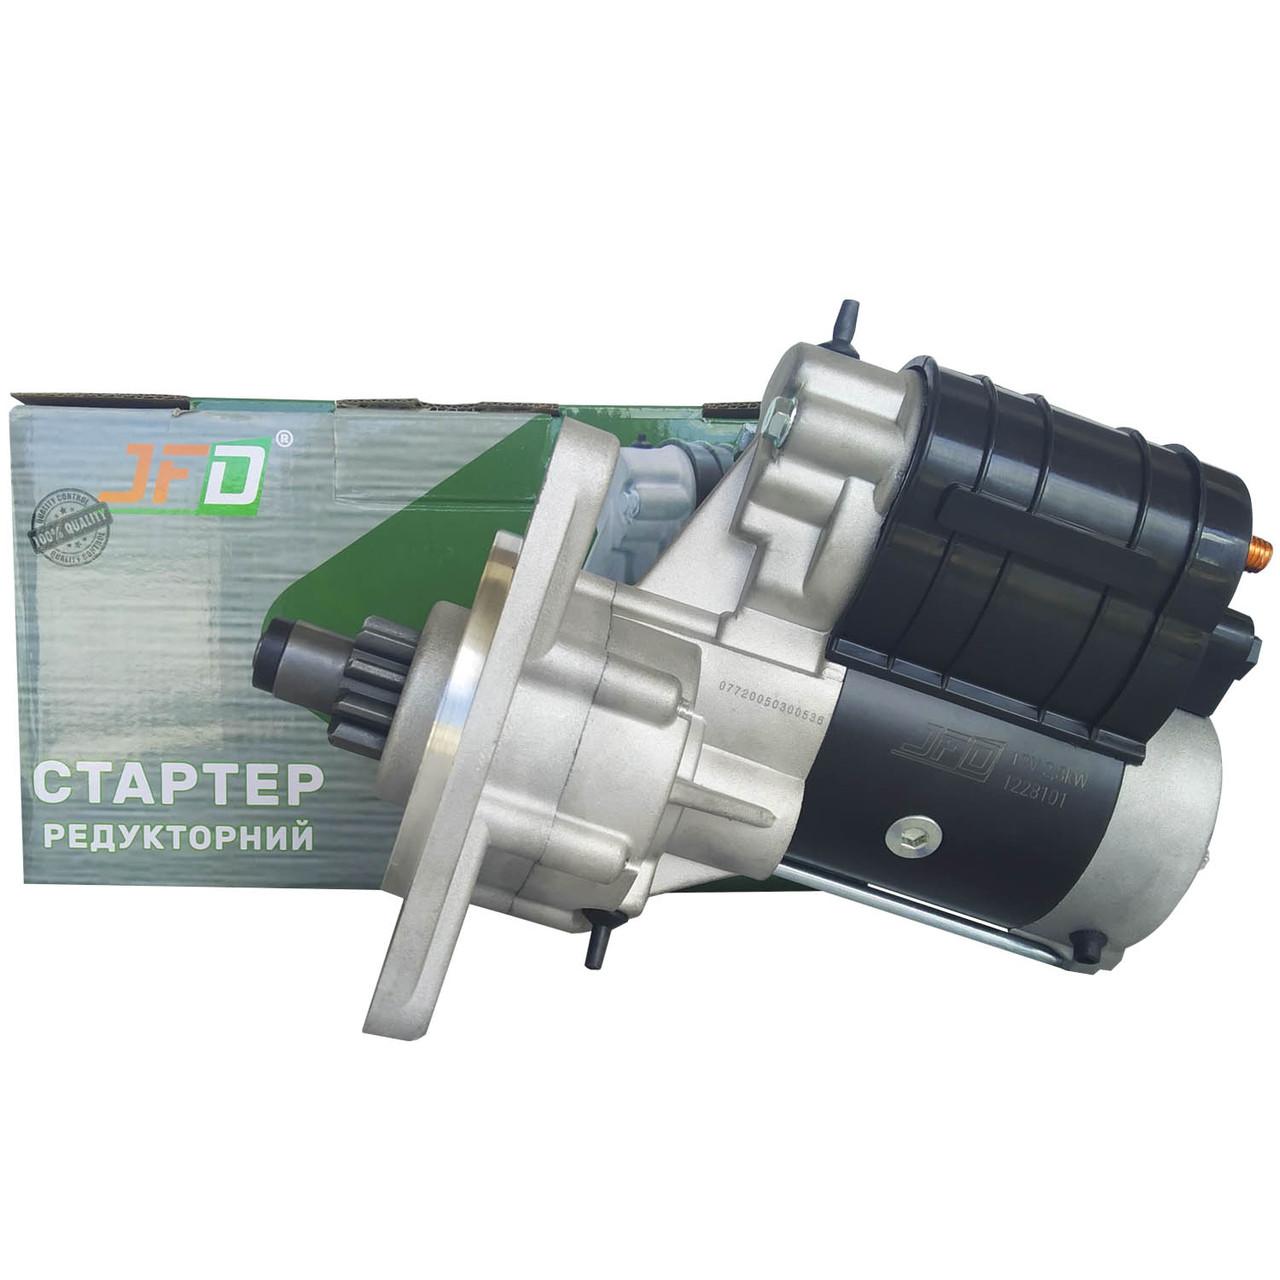 Стартер редукторний МТЗ Т40 Т25 JFD 12В 2,8 кВт арт. 1228101 (аналог Jubana 123708101)